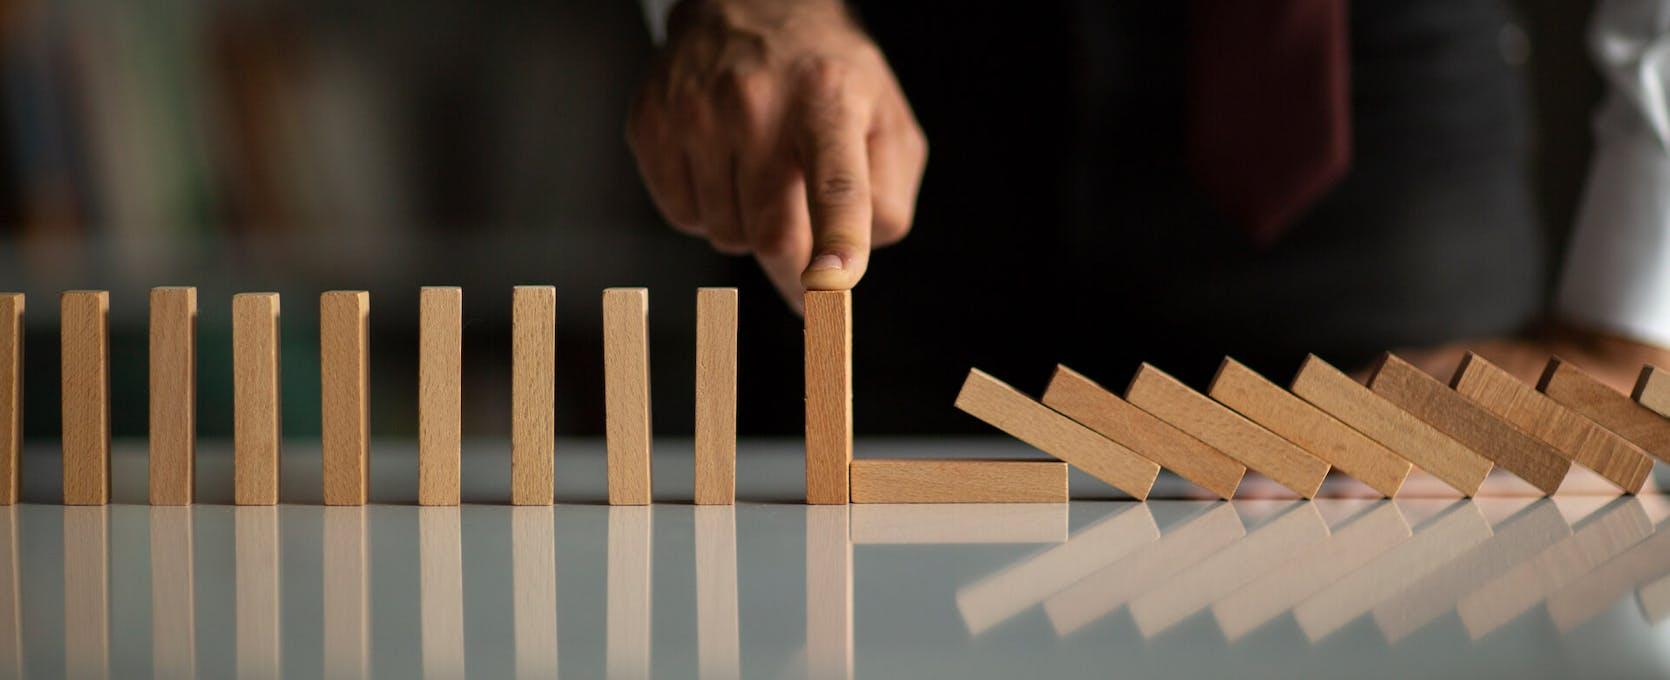 Enterprise Risk Management for Life Science Companies